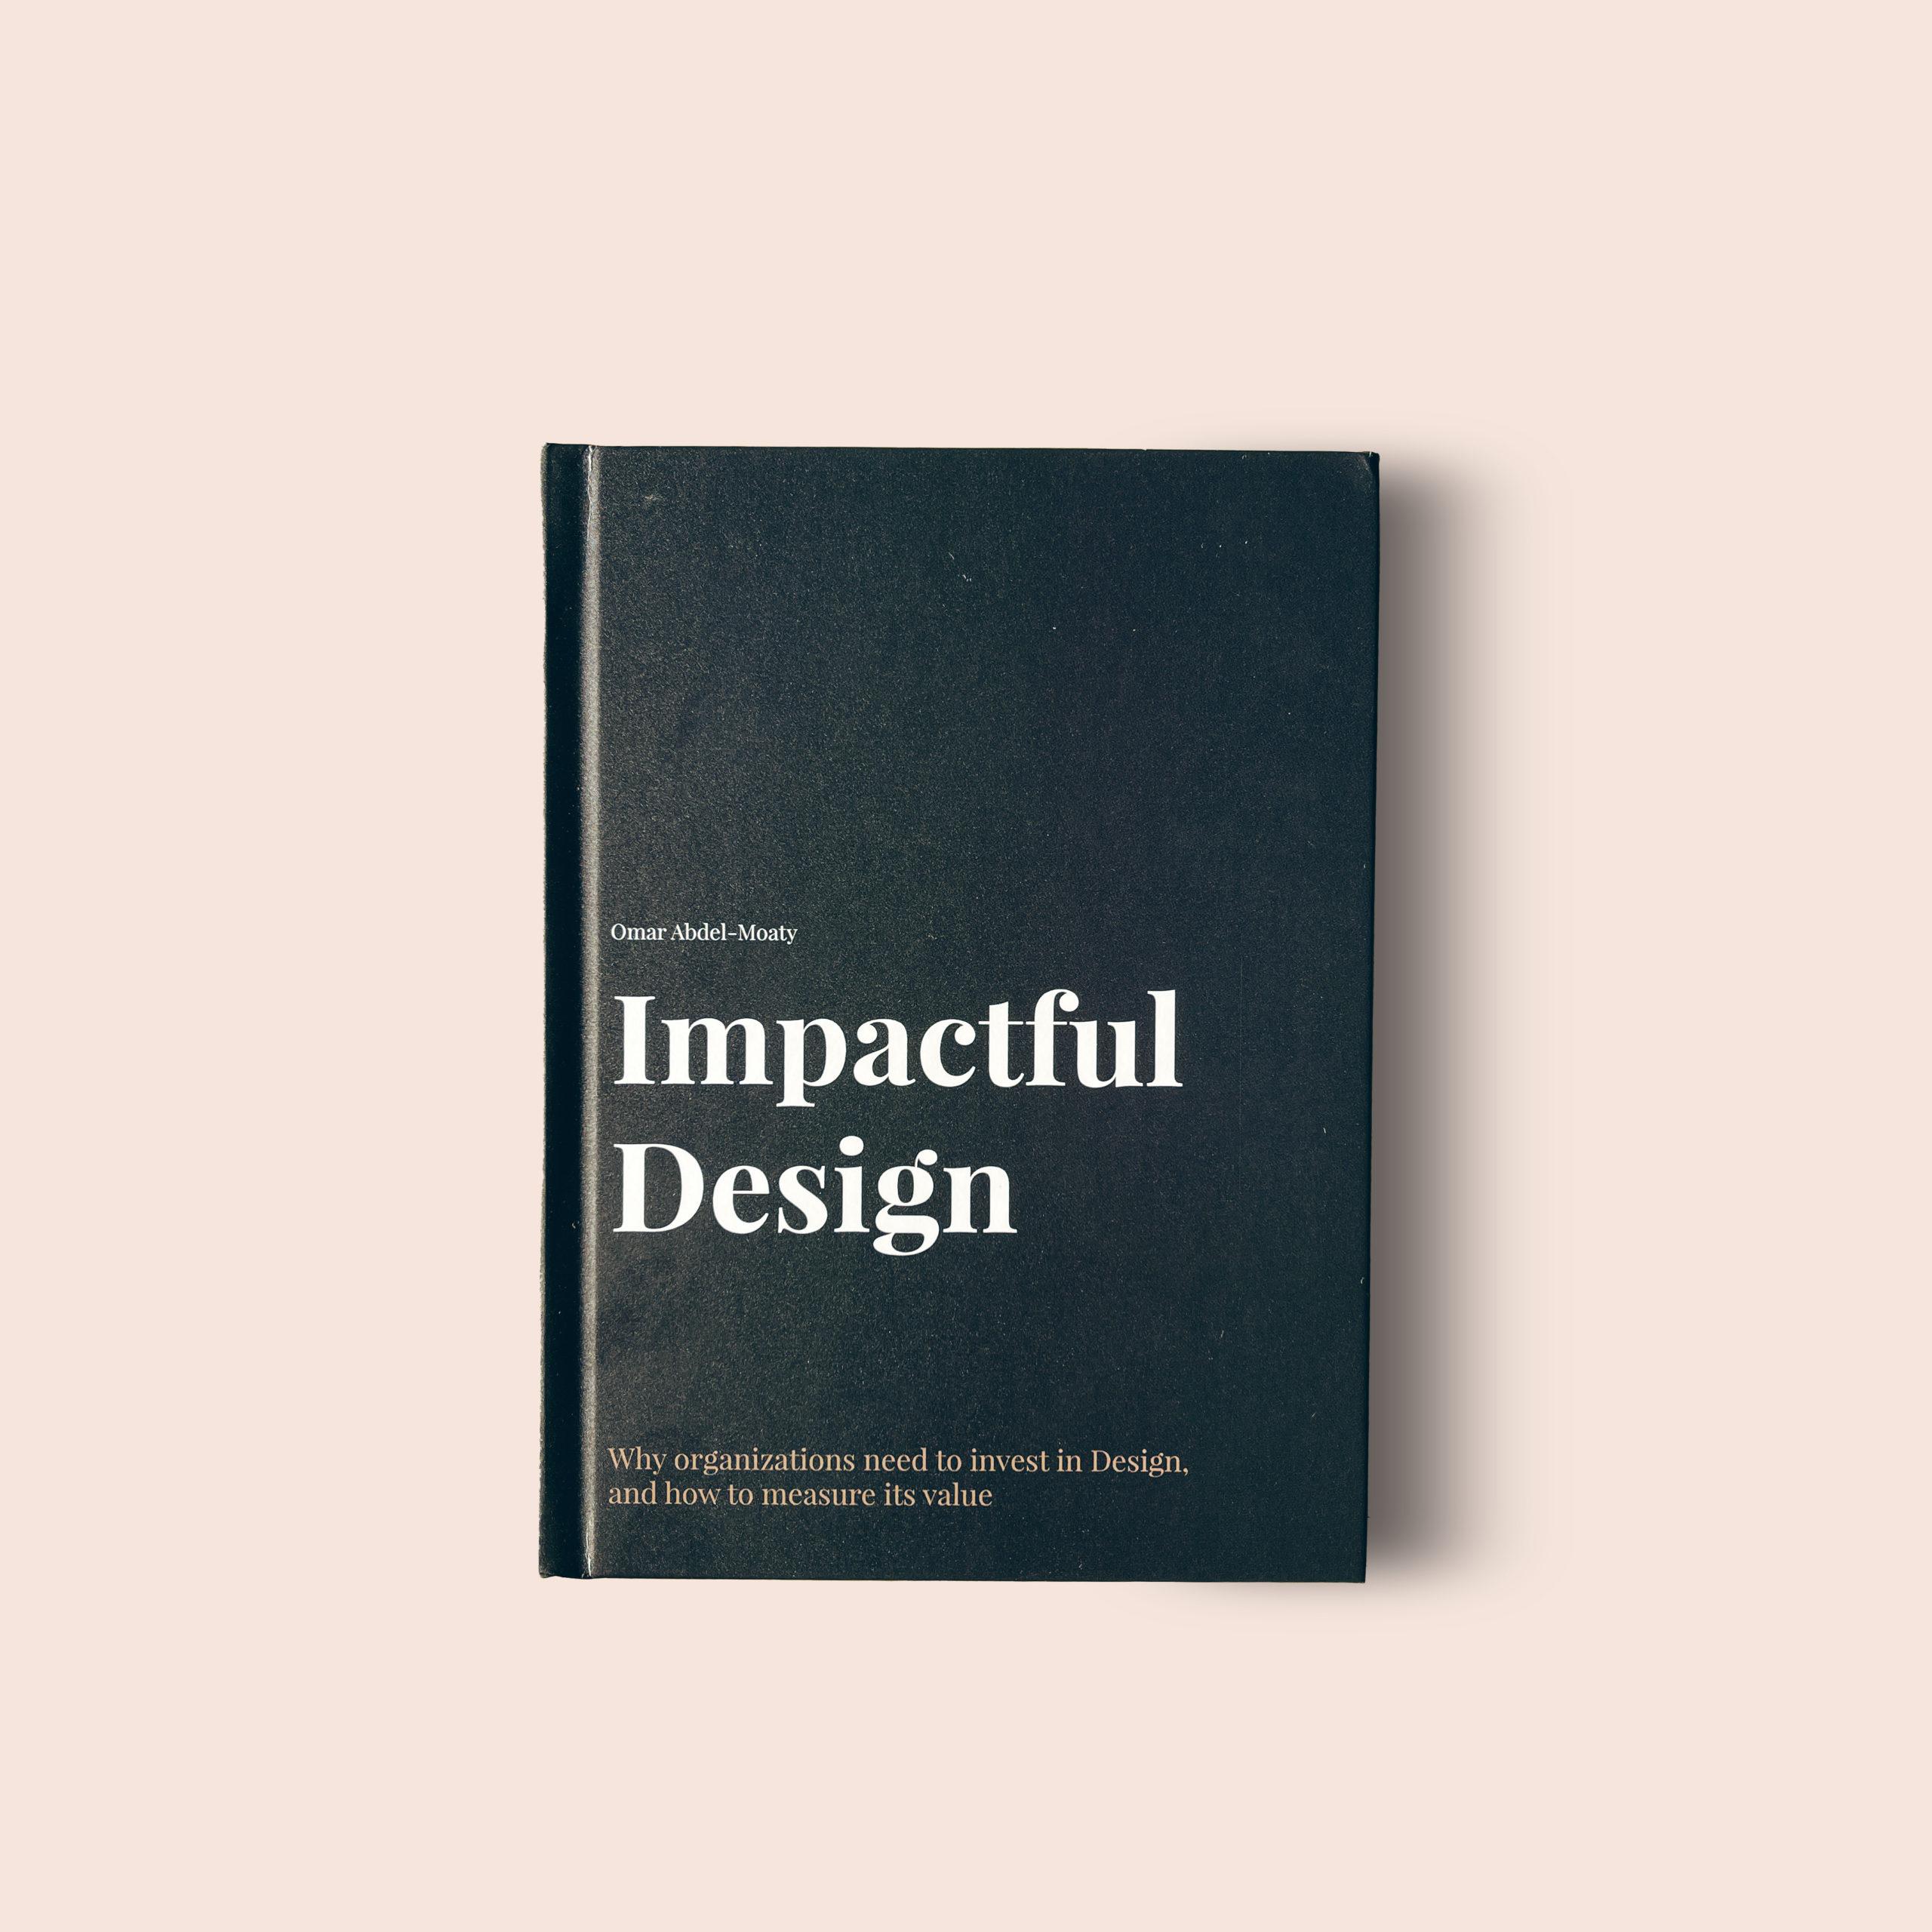 Impactful Design